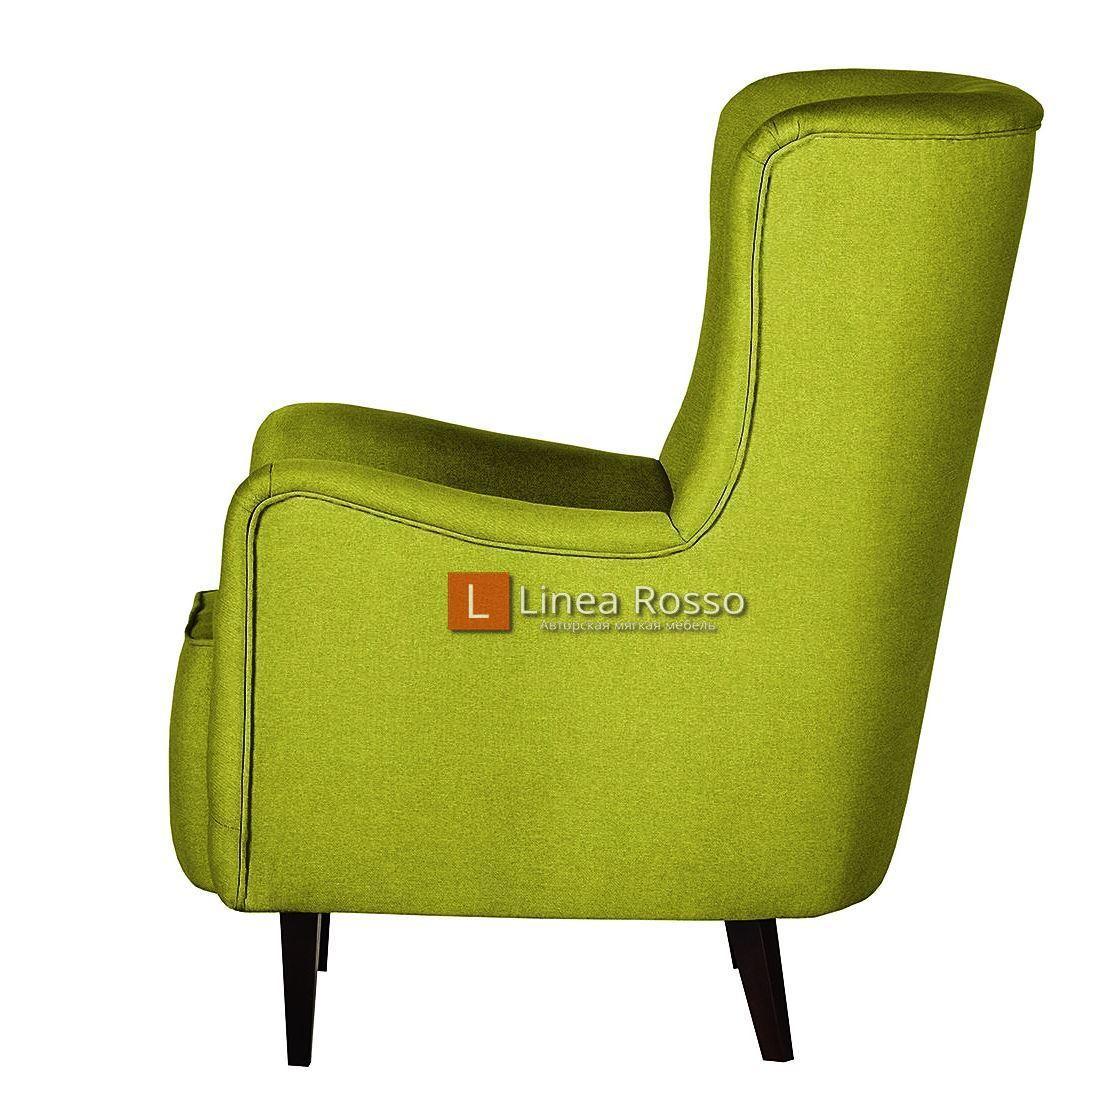 salatovoe kreslo5 - Кресло в салатовом цвете на заказ